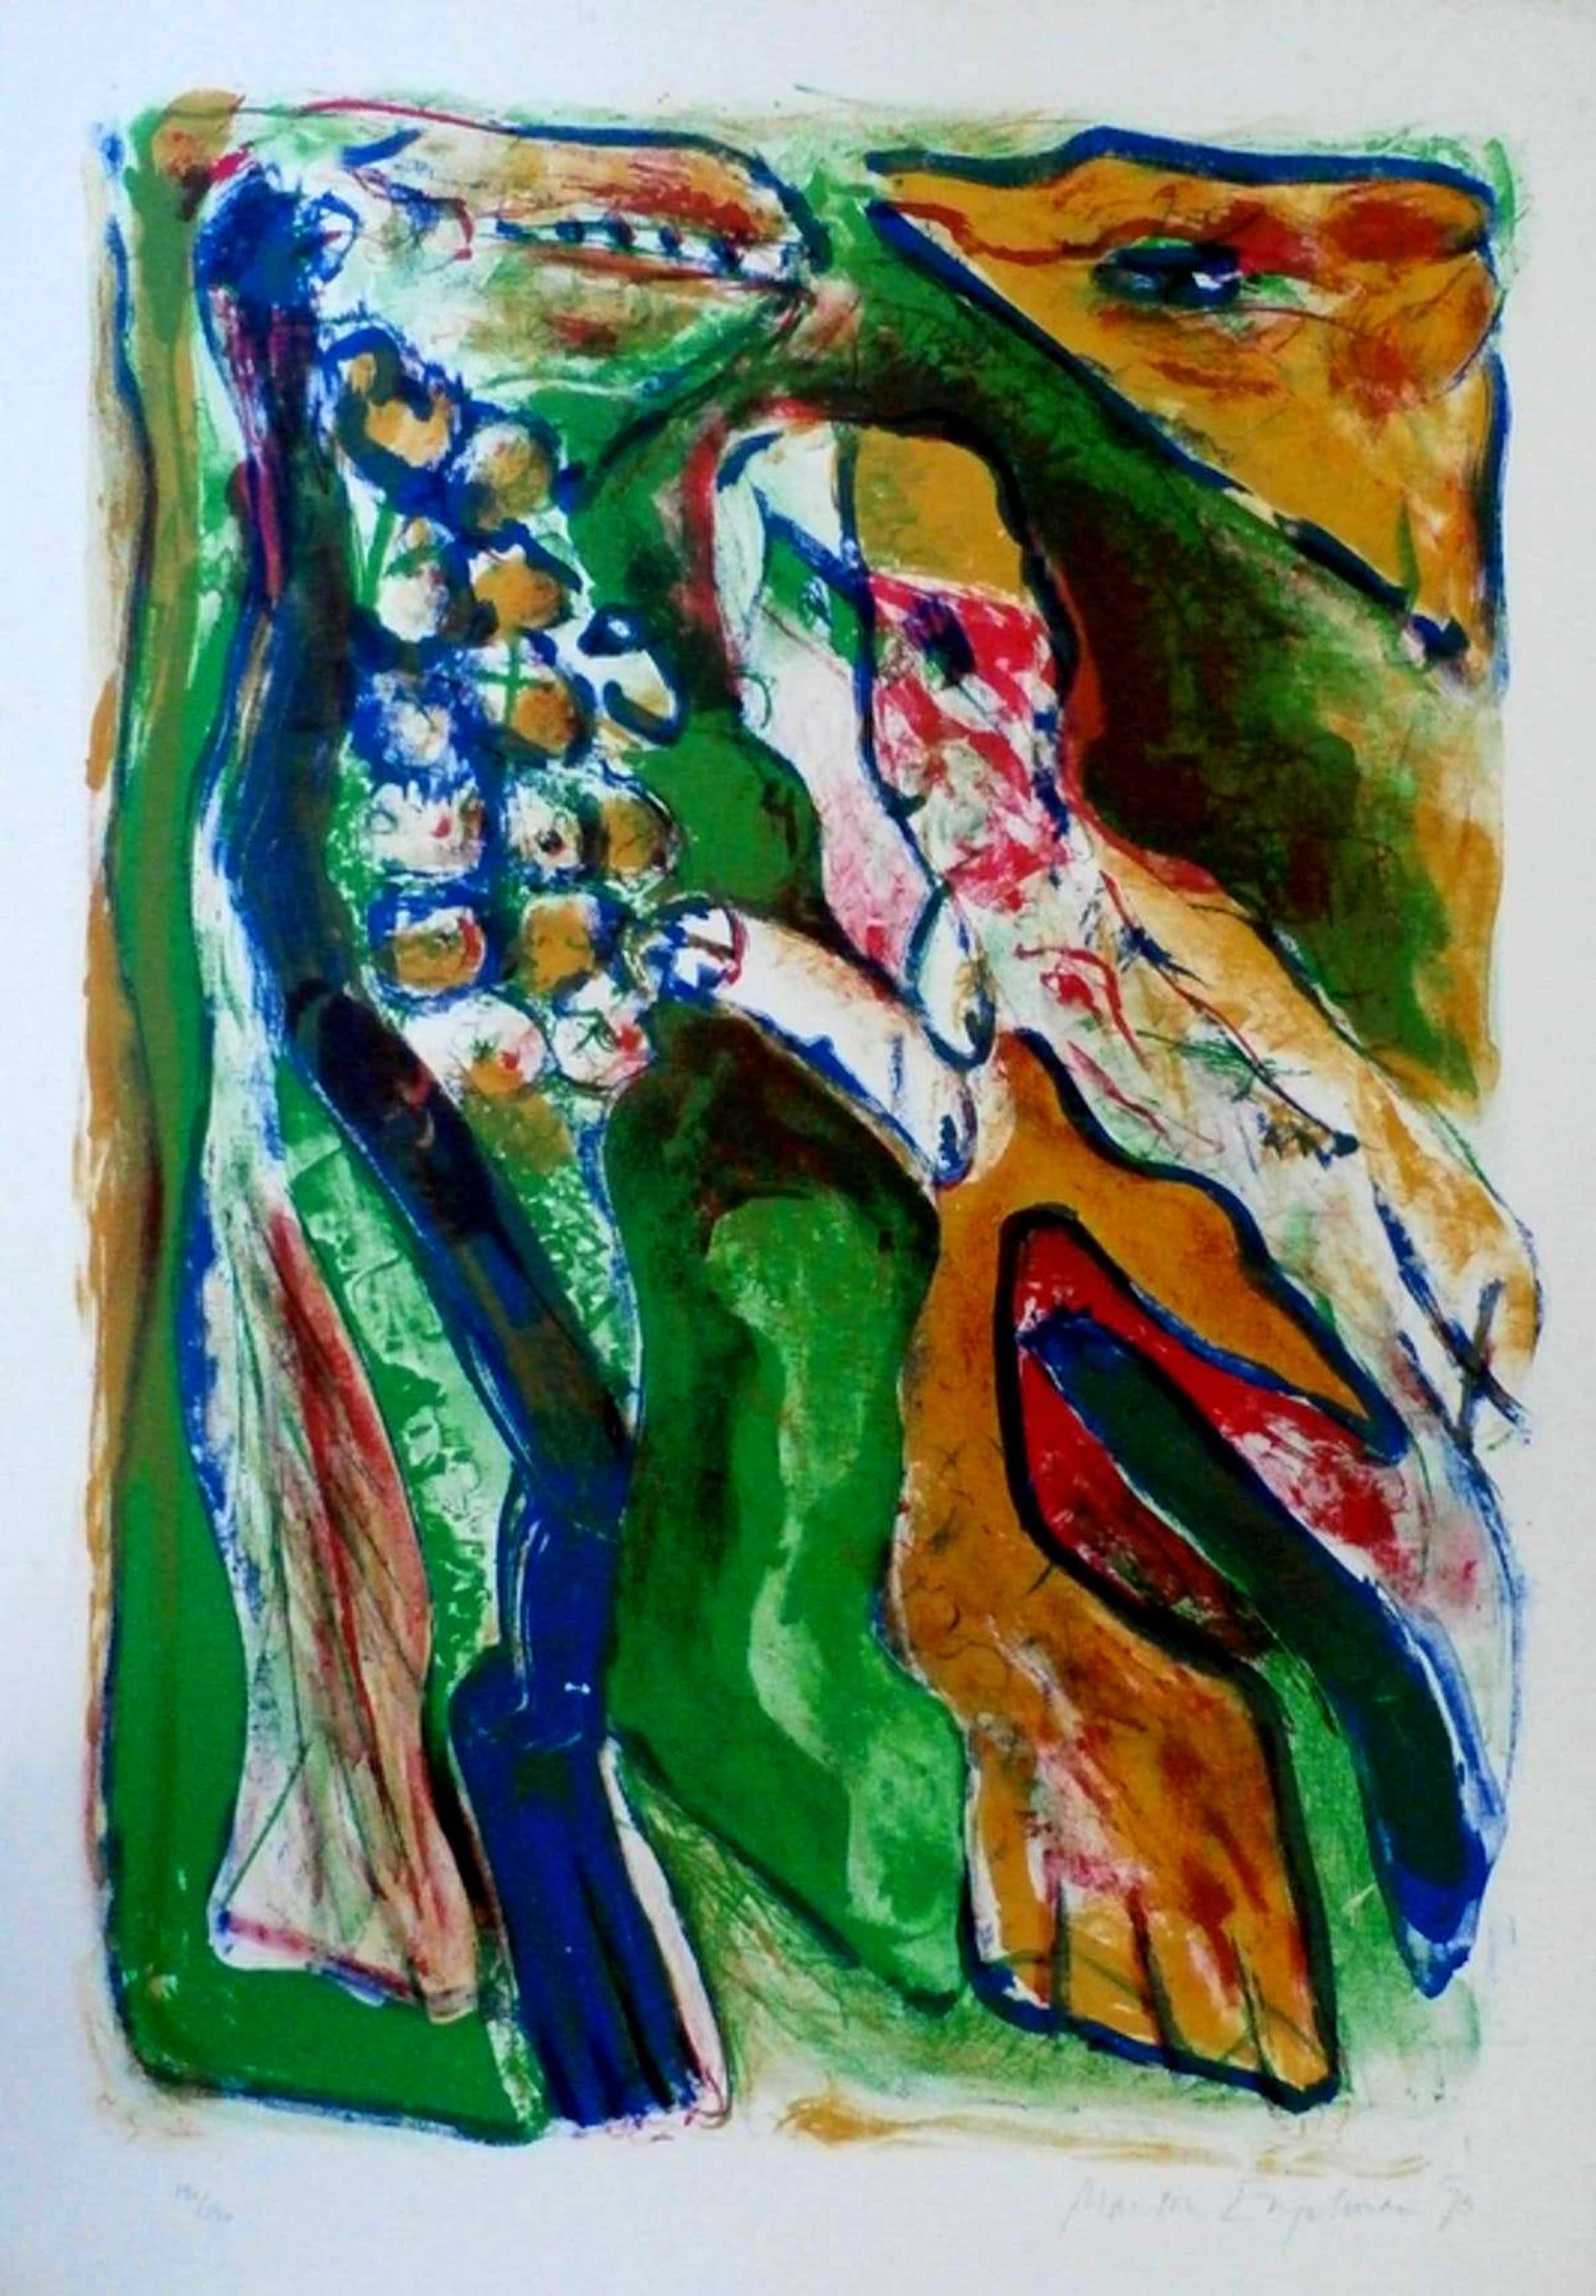 Martin Engelman - Kleurenlitho: 'Rendez-vous Au Jardin Zoologique' - 1973 kopen? Bied vanaf 45!